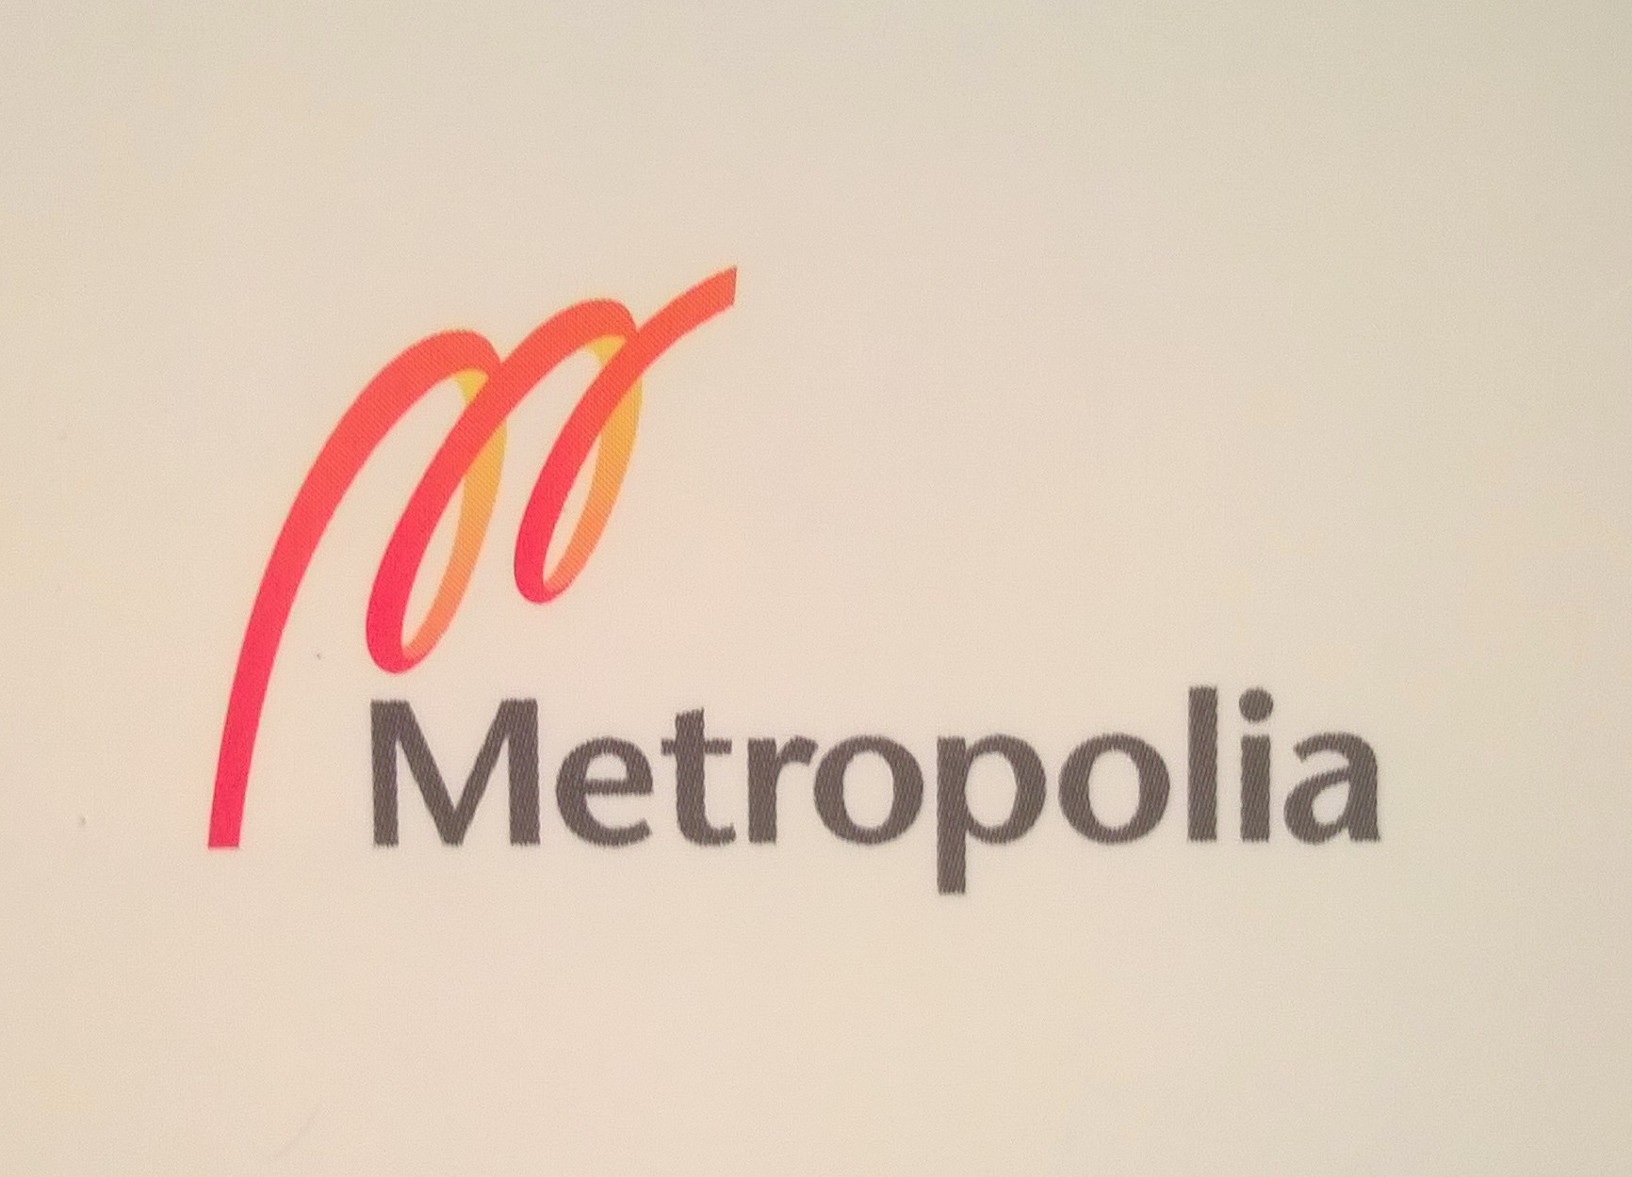 metropolia logo • Sonografia – Tuki- ja liikuntaelimistön ultraäänikuvaus